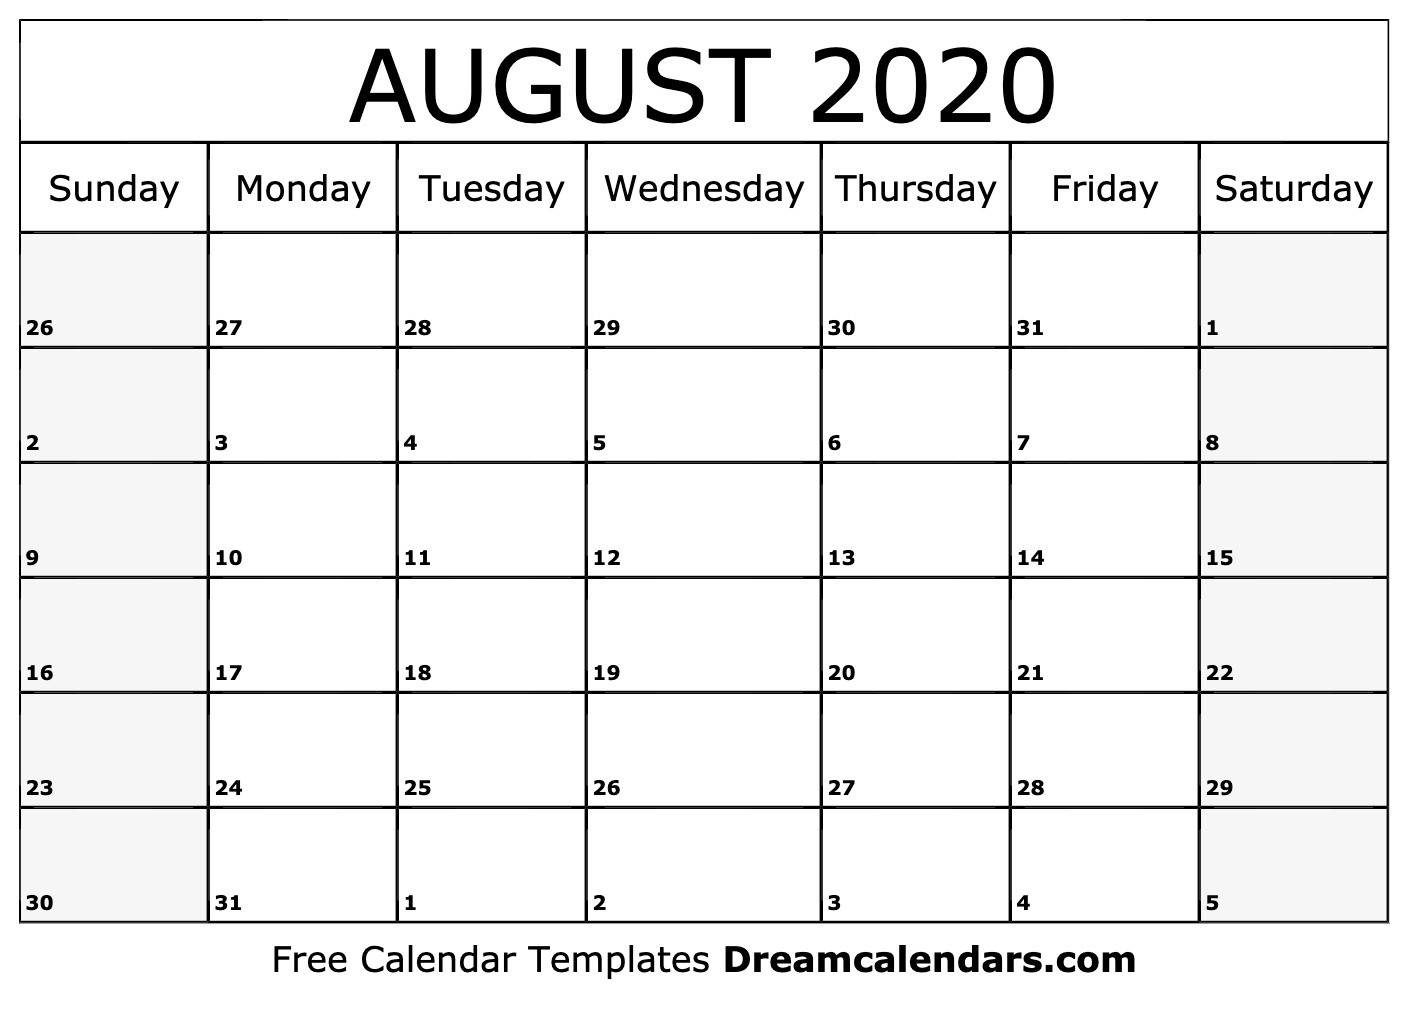 Free Blank August 2020 Printable Calendar-August 2020 Colorful Calendar Template